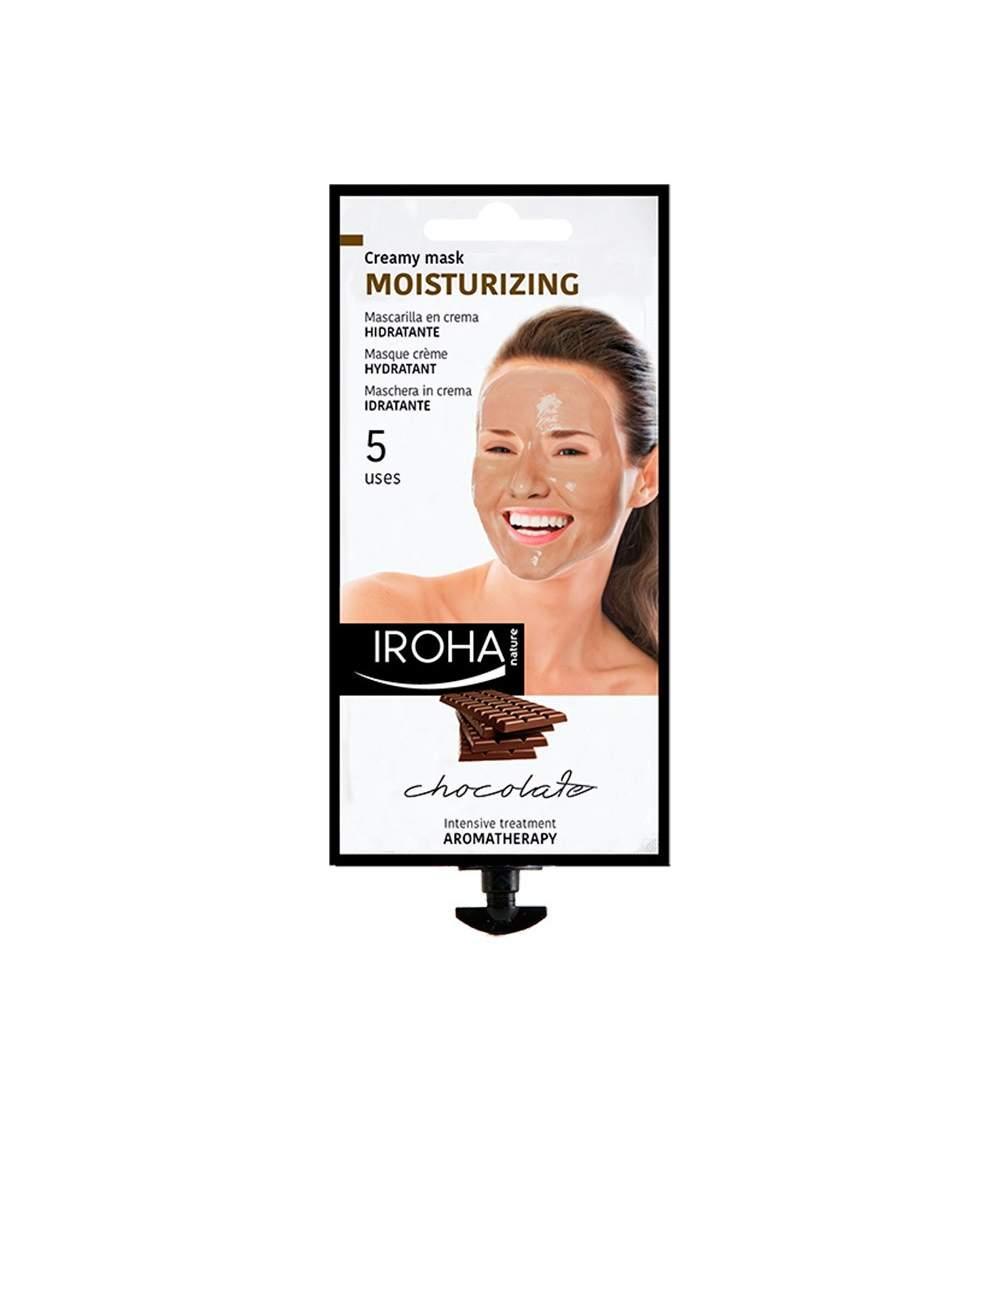 Masque Facial Hydratant de Chocolat en Crème. Iroha Nature.